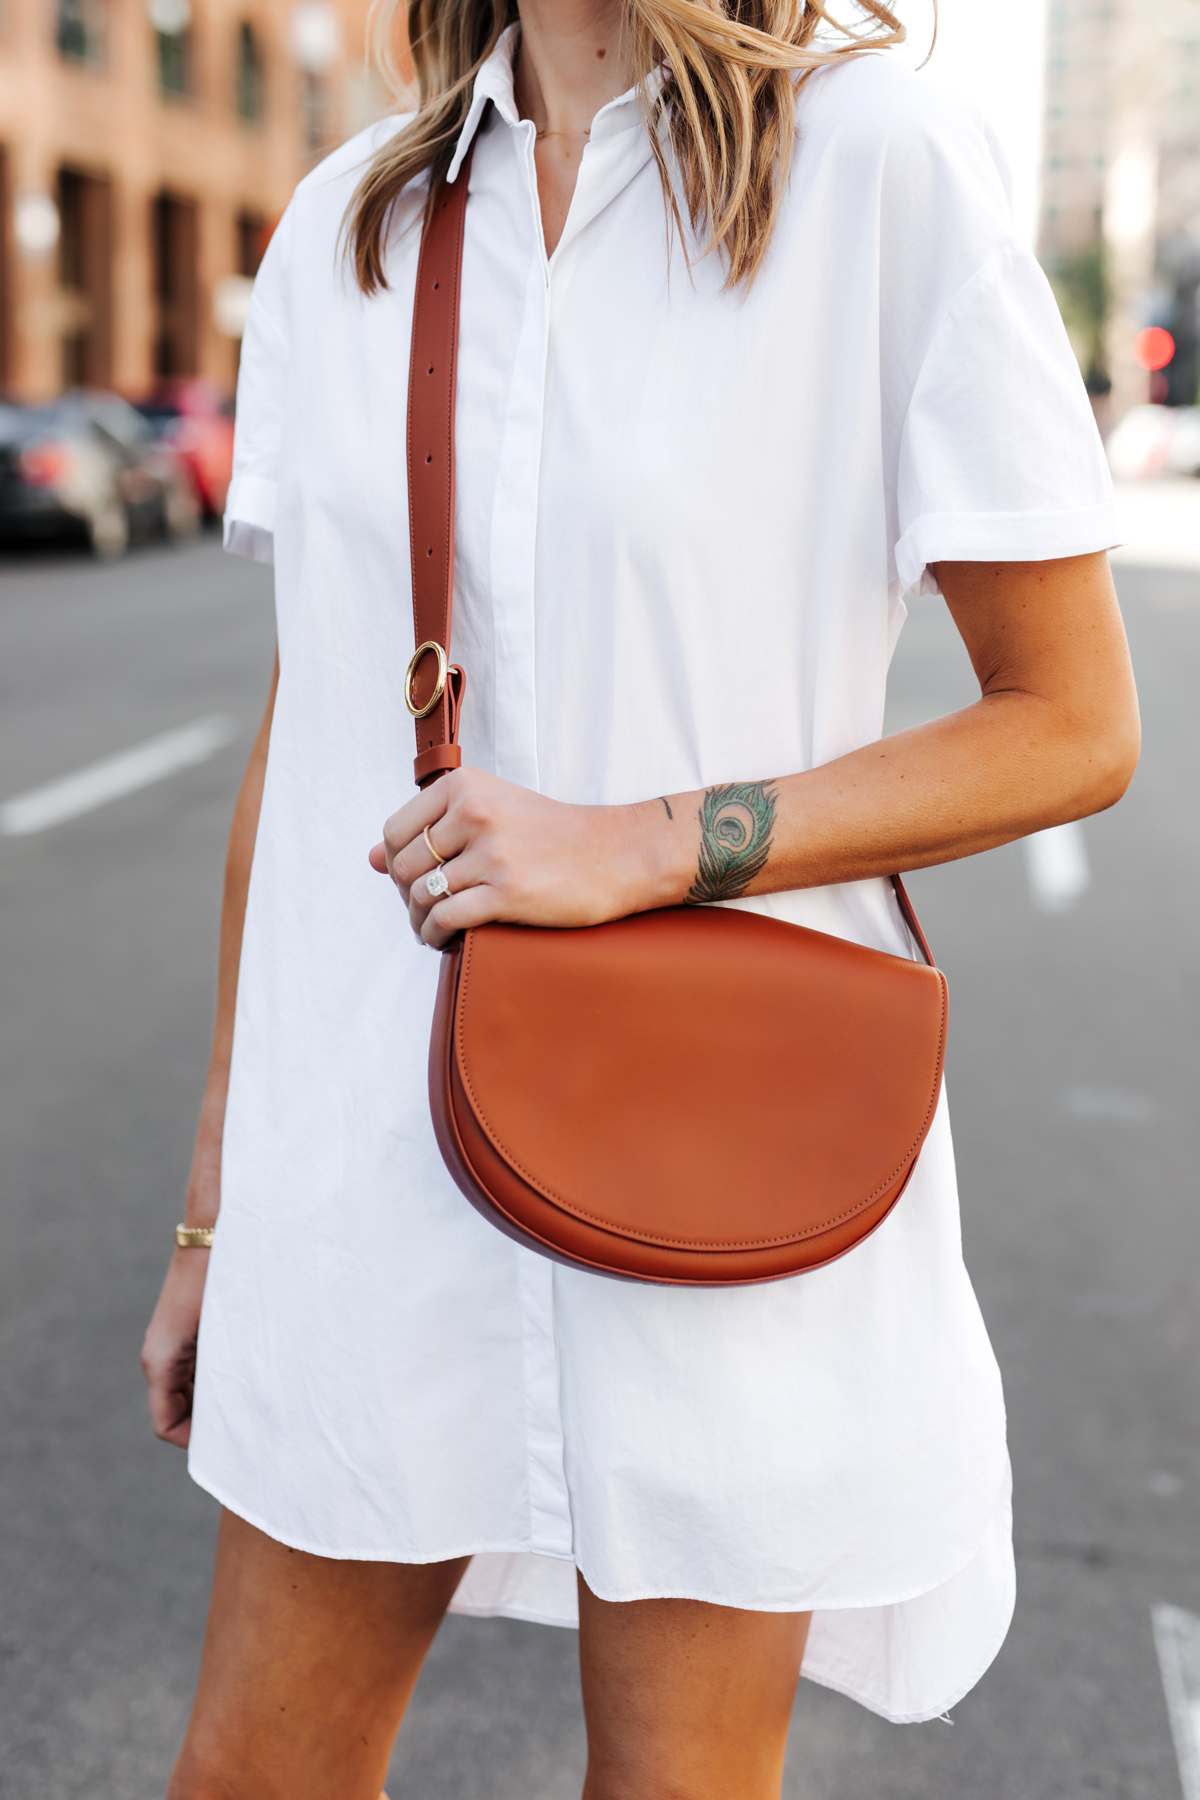 Woman Wearing White Shirtdress Cuyana Half Moon Bag Caramel Fashion Jackson San Diego Fashion Blogger Street Style